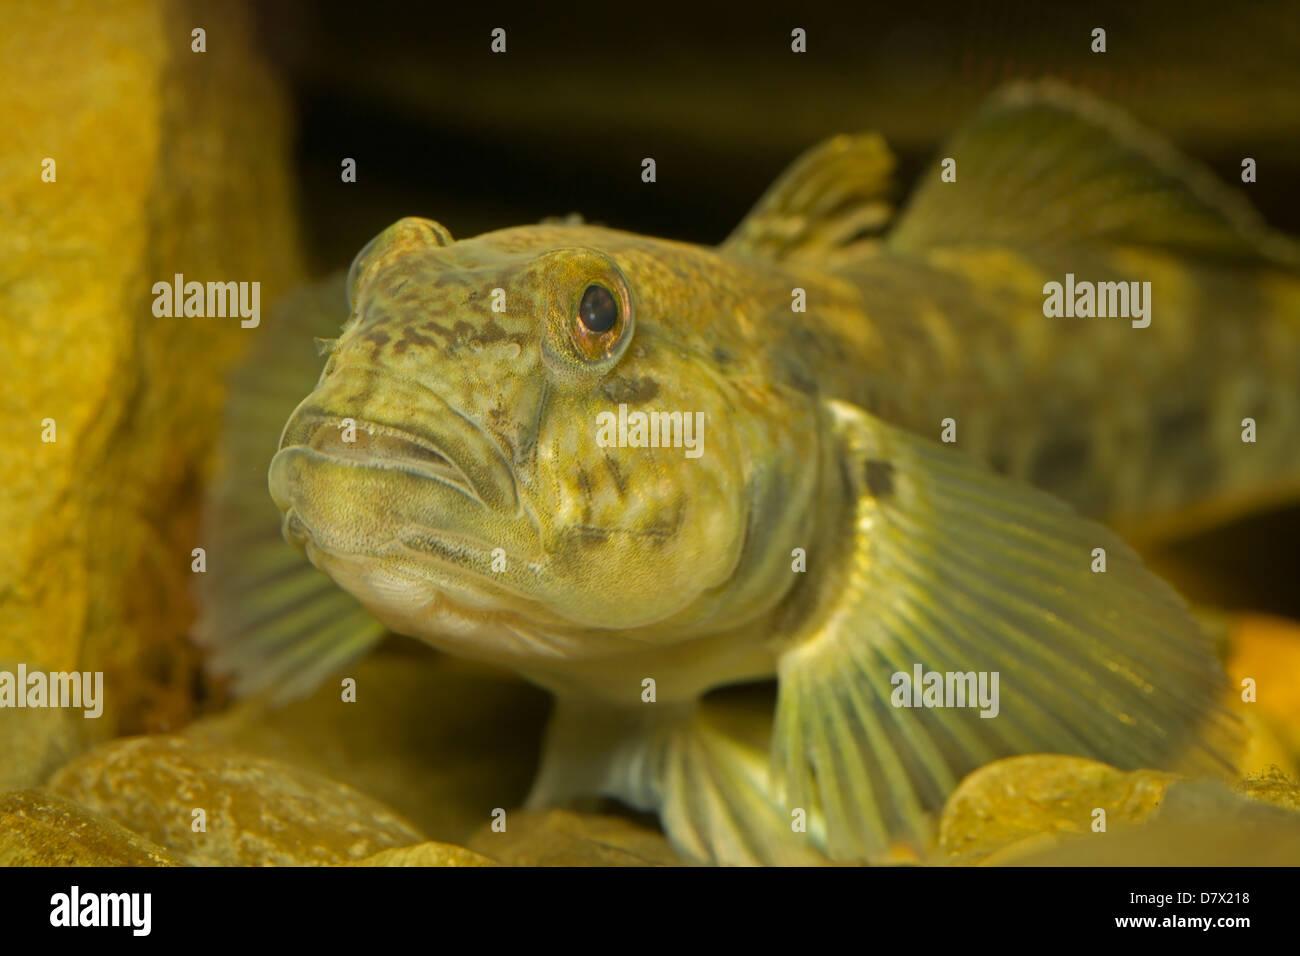 Freshwater fish kauai - Slimy Sculpin Cottus Cognatus Freshwater Fish Native To North America Stock Image